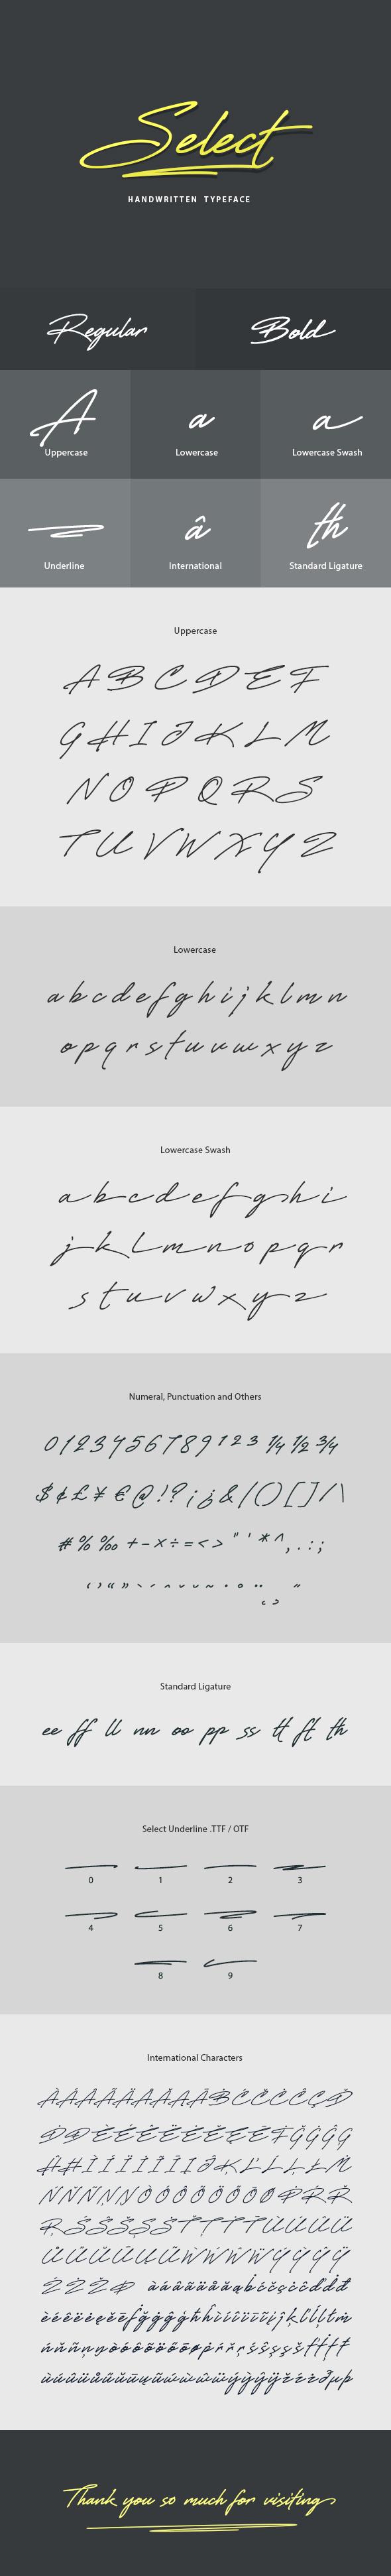 GraphicRiver Select Handwritten Font 21095931